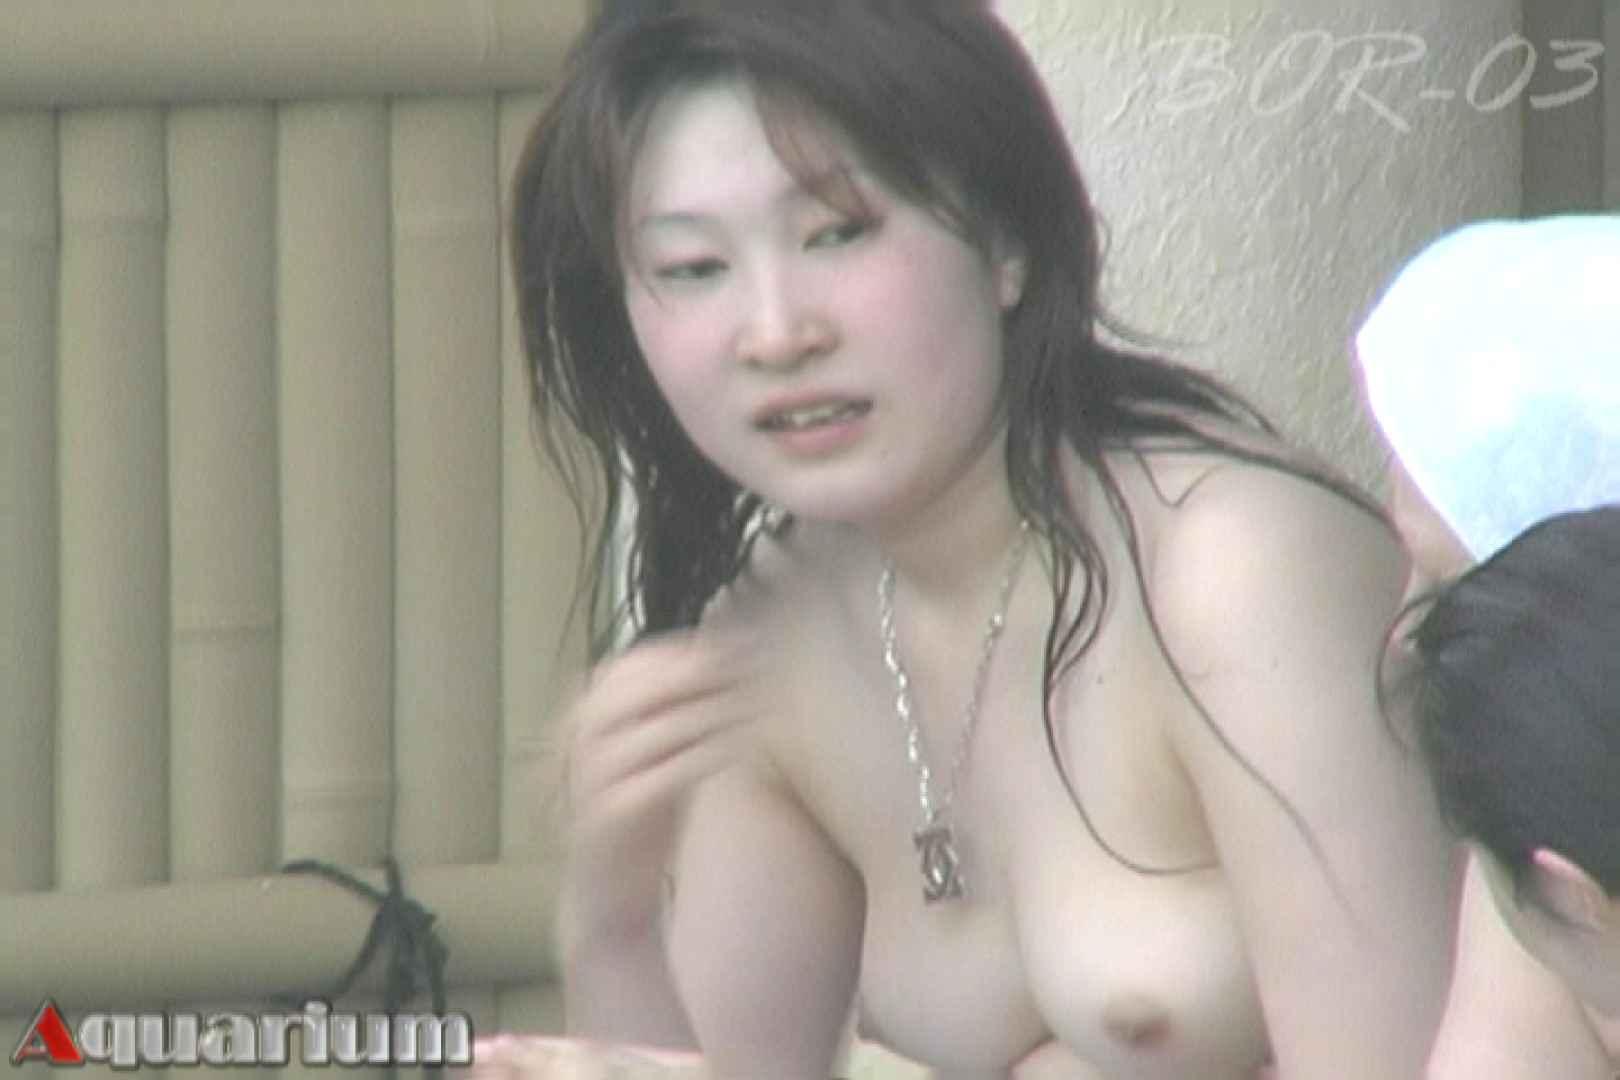 Aquaな露天風呂Vol.486 盗撮師作品  69pic 69